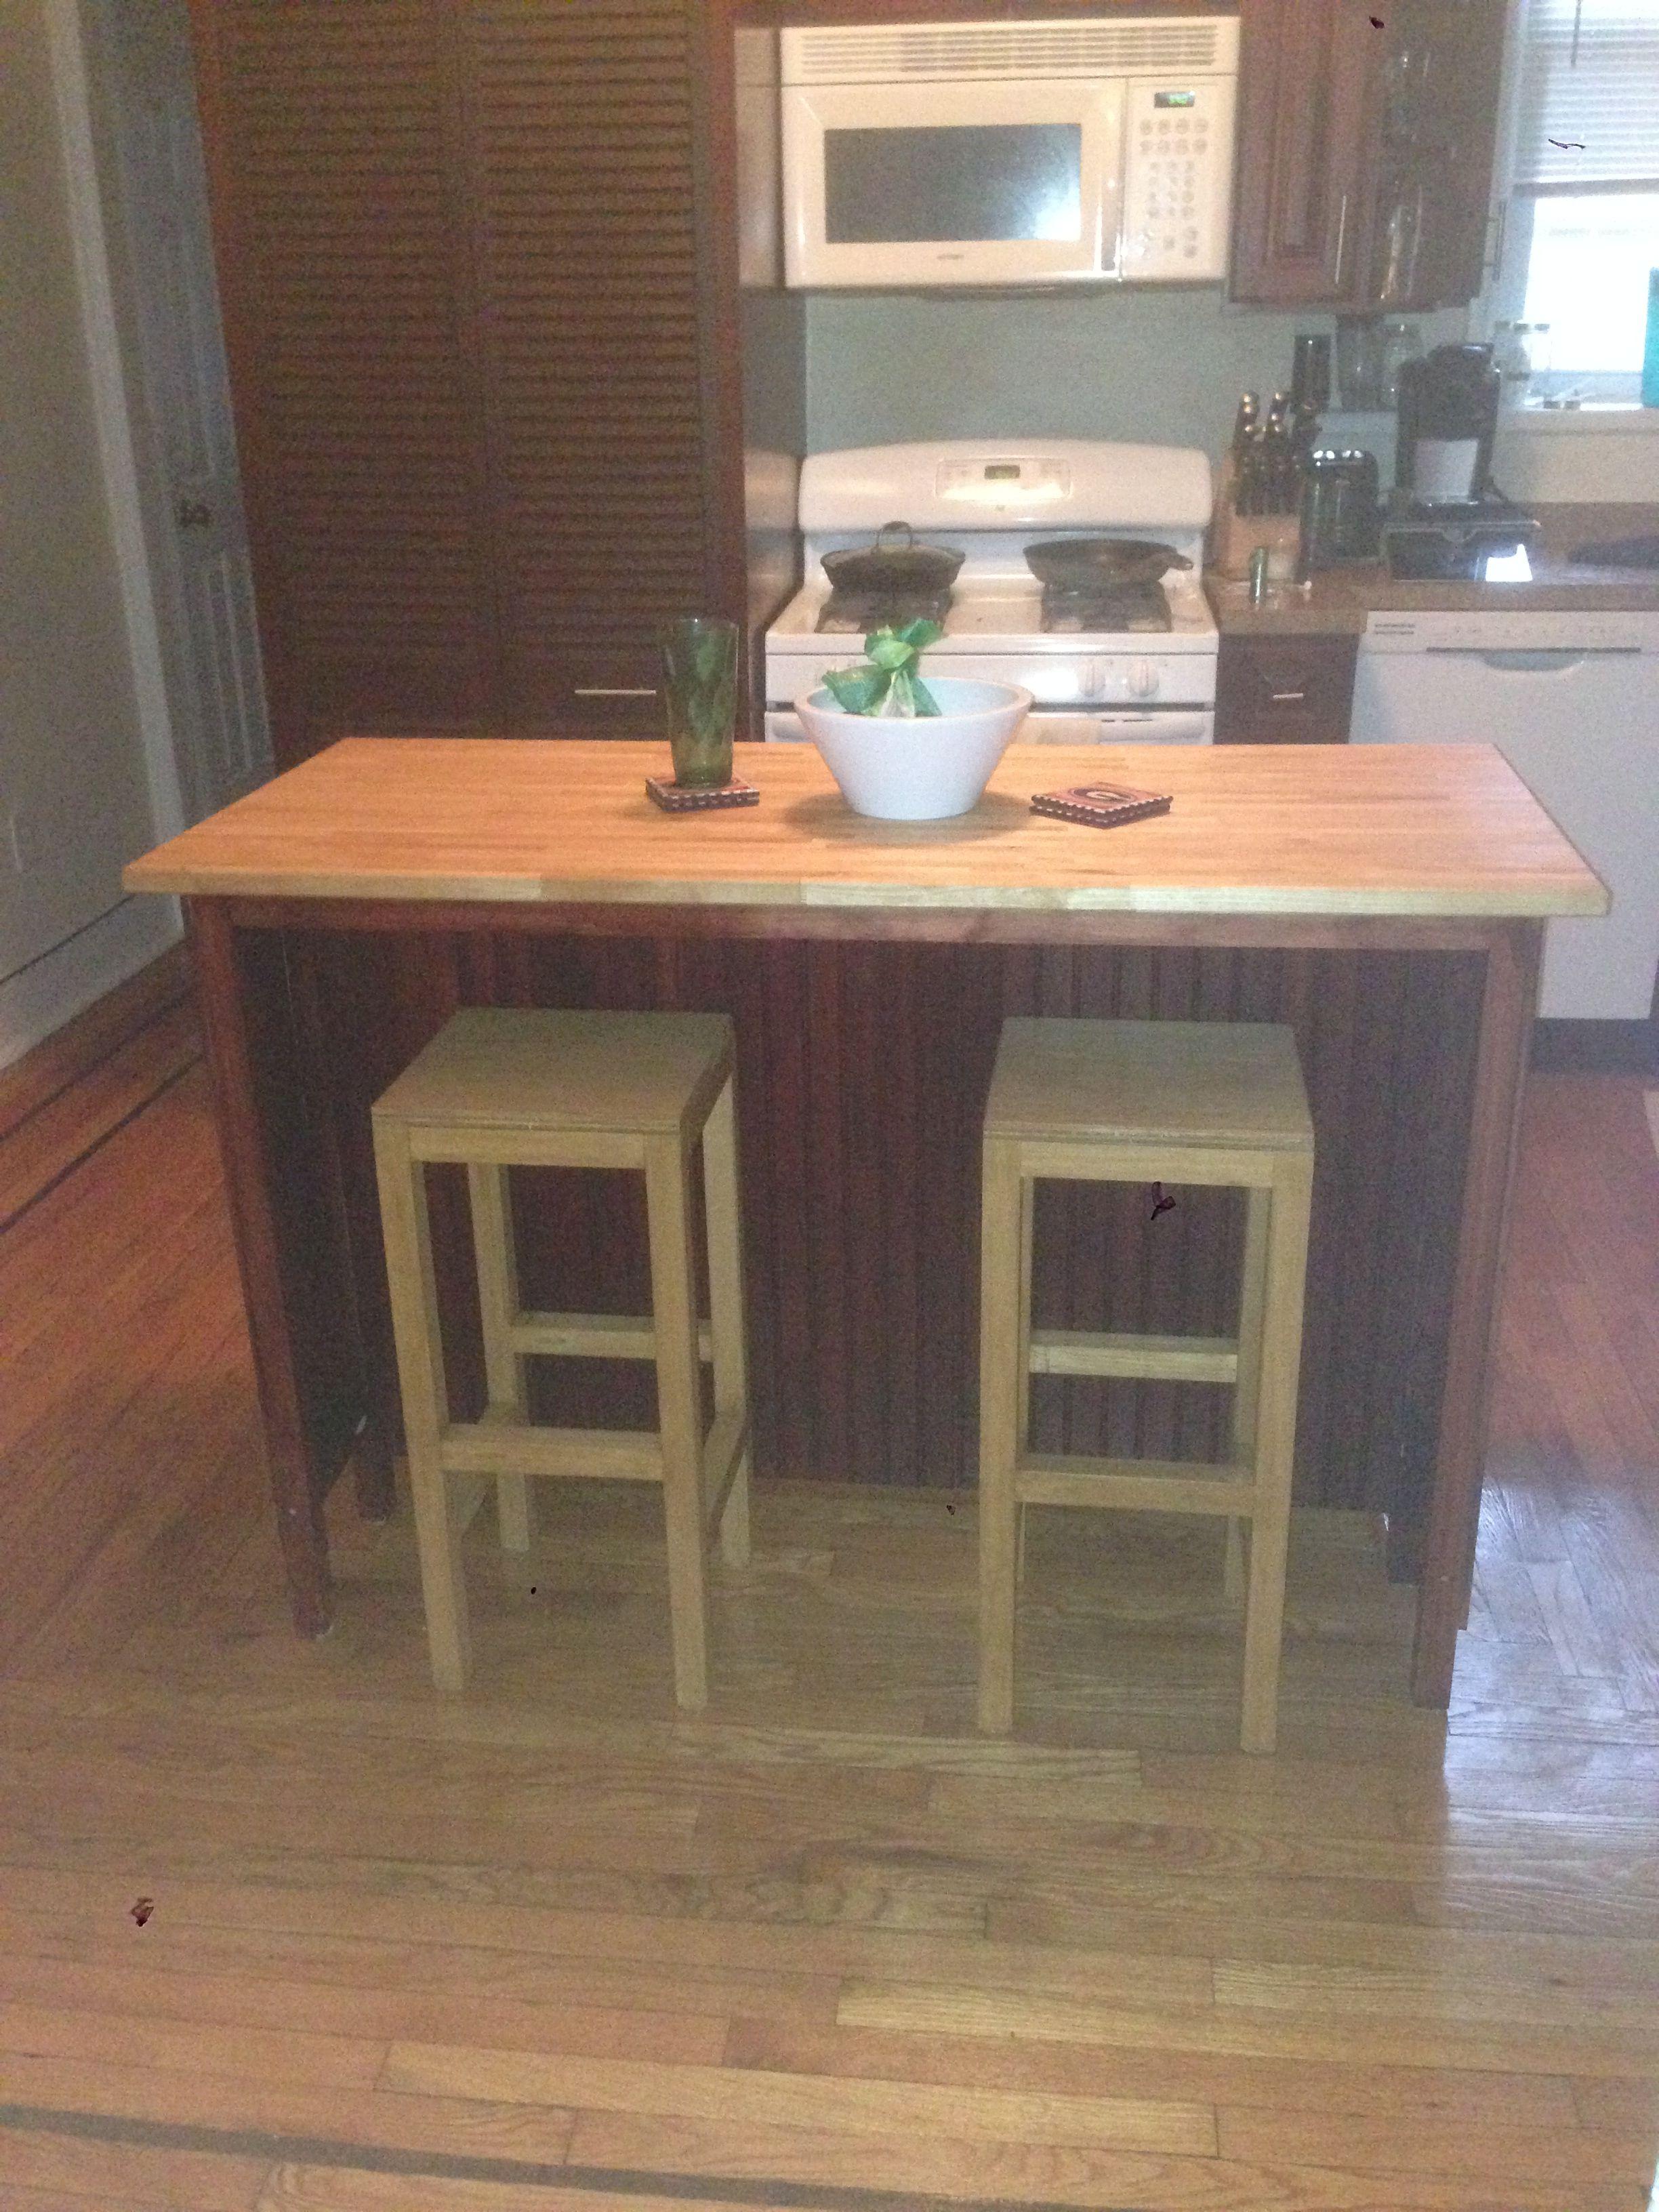 Kitchen Island with Bar Stools